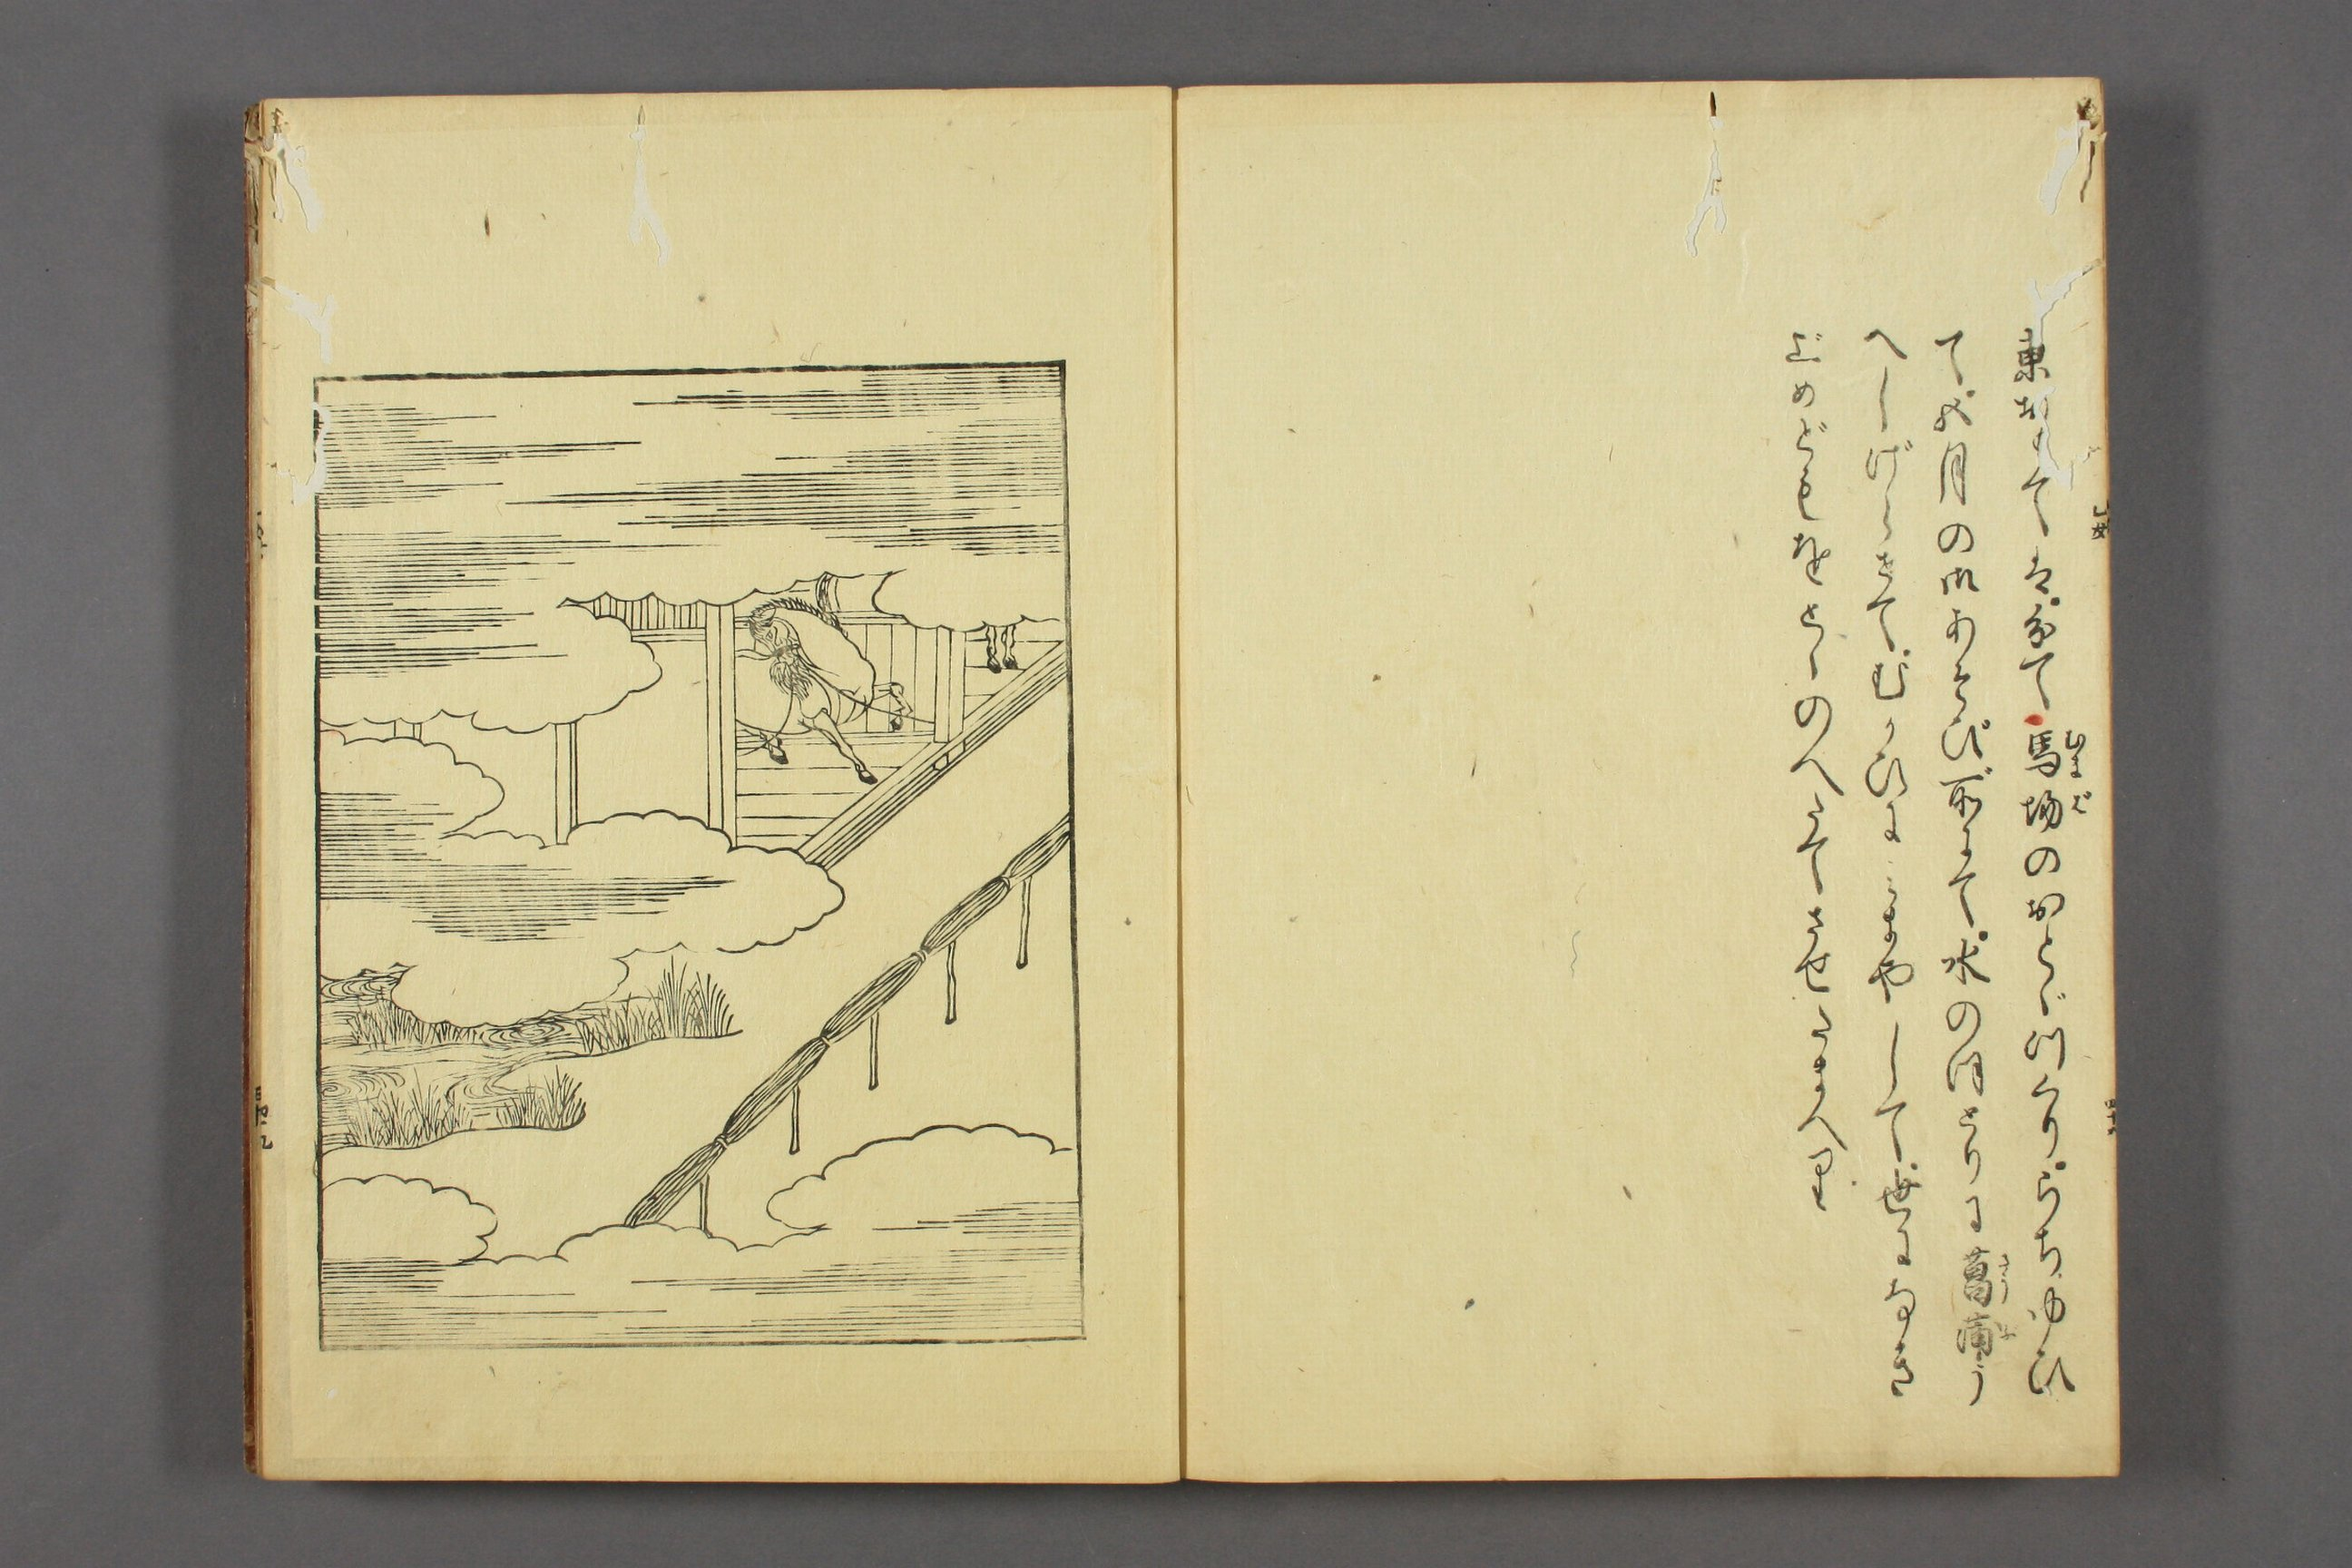 http://archive.wul.waseda.ac.jp/kosho/bunko30/bunko30_a0007/bunko30_a0007_0021/bunko30_a0007_0021_p0050.jpg